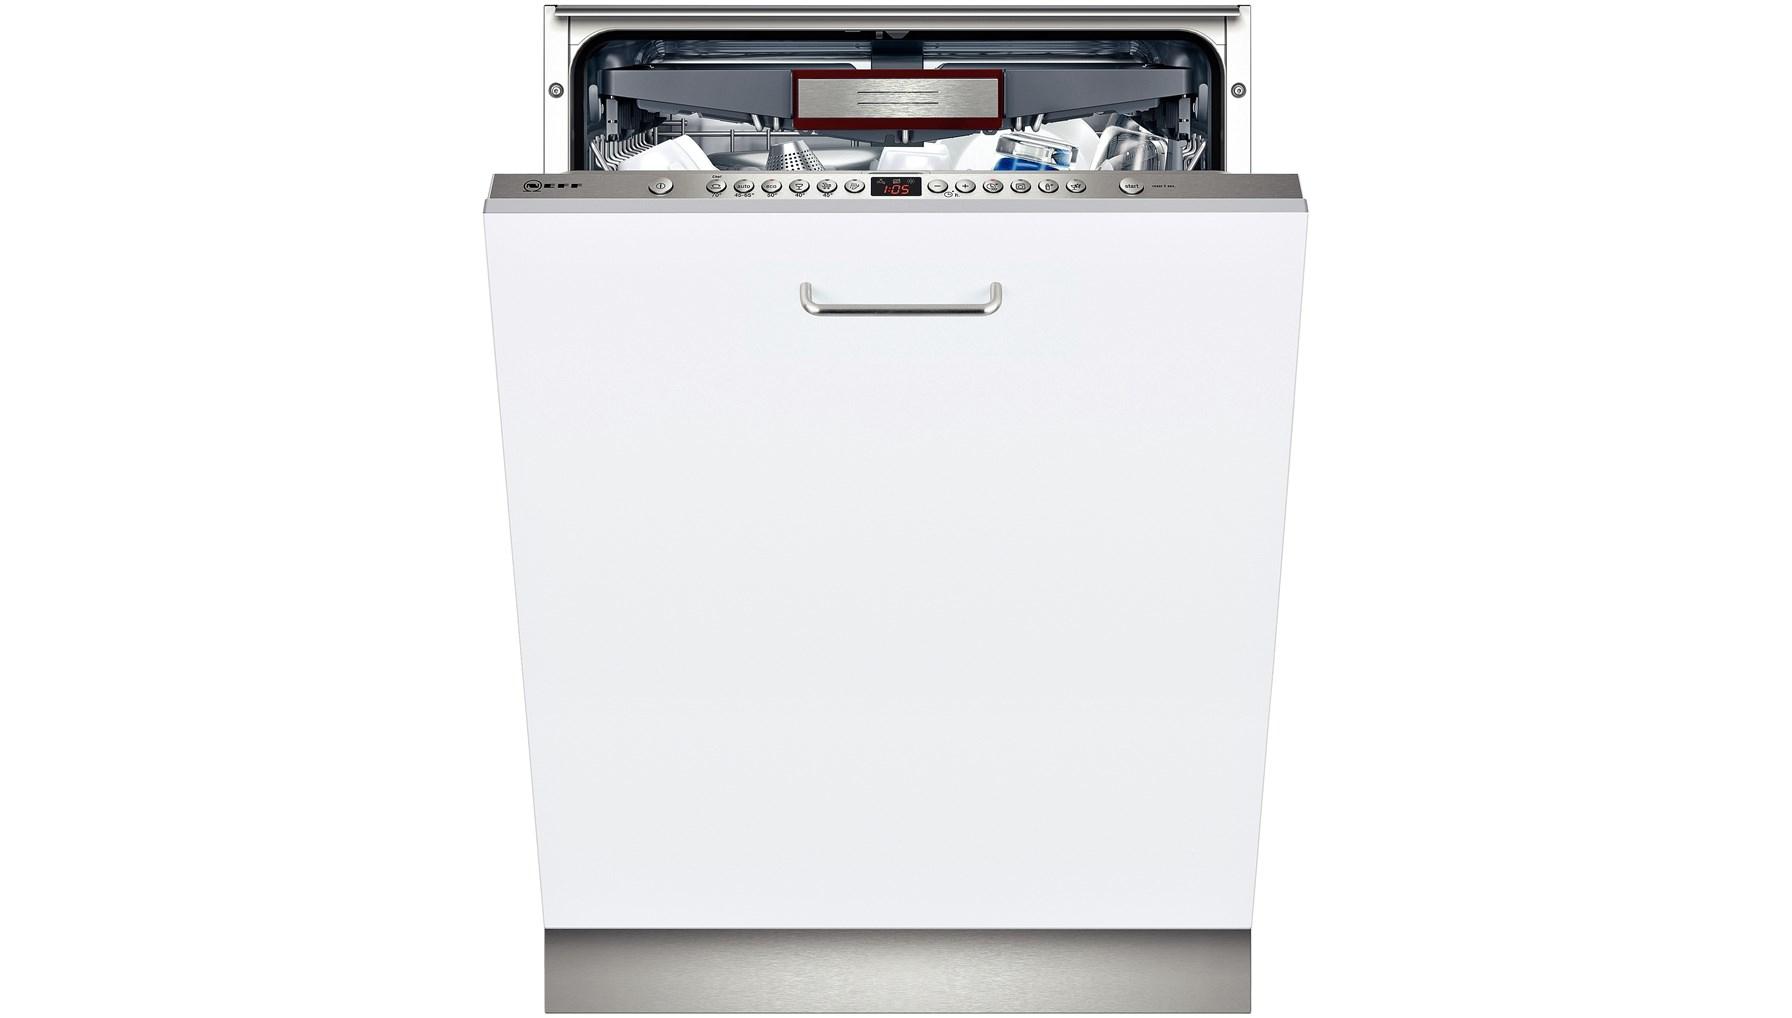 Spülmaschine 60Cm - Wholesalejerseyscheapjerseys.Com